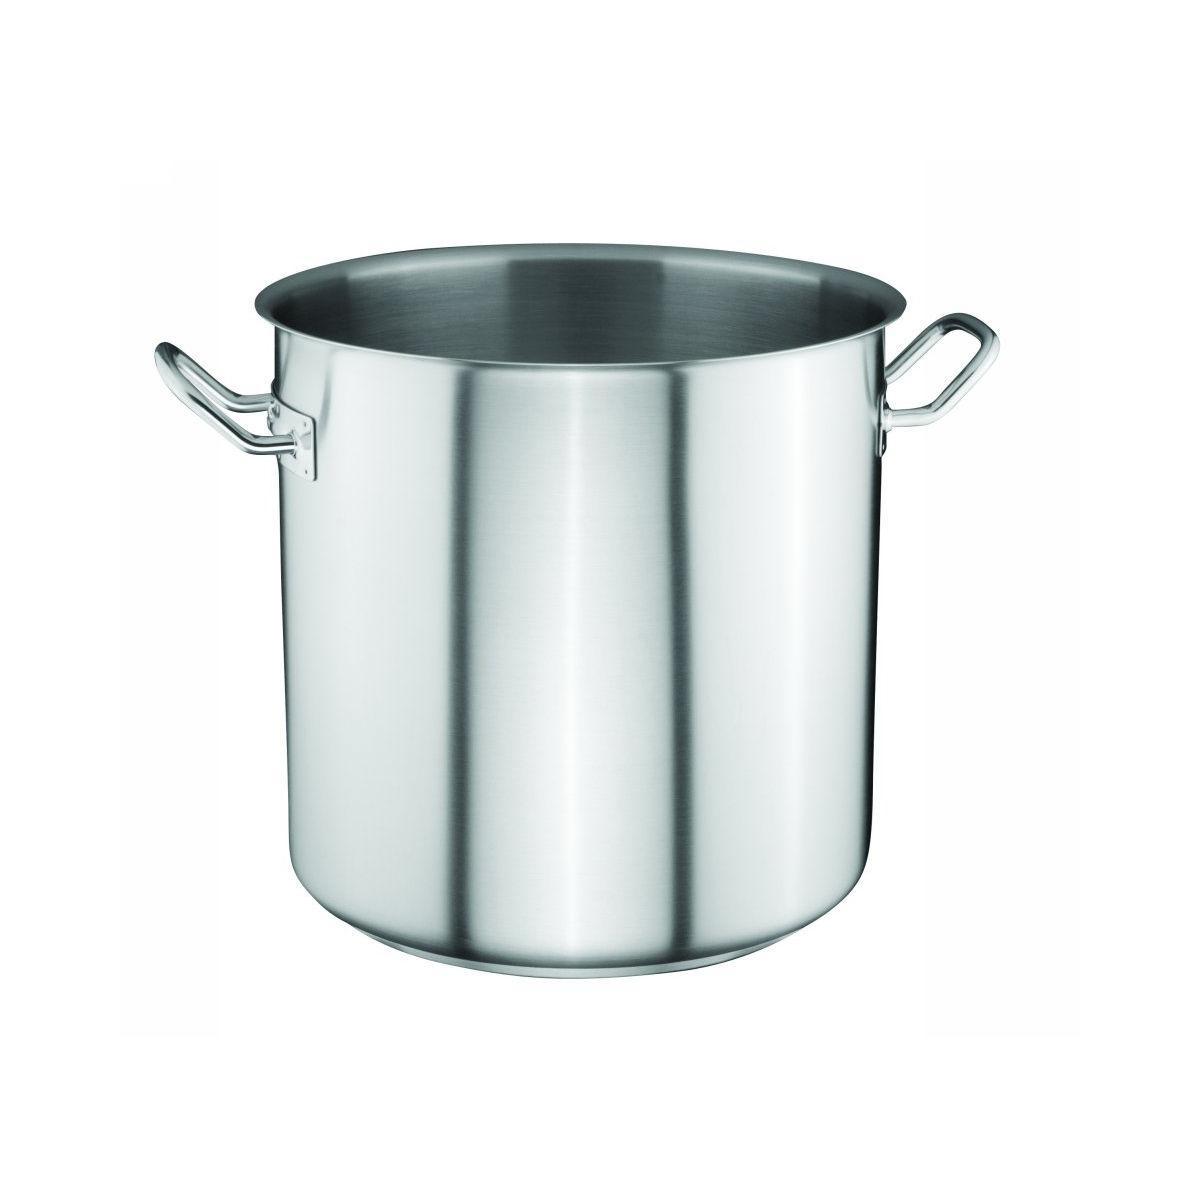 Oala Gastro Inox 10.5 L / 24*24 Cm 2021 aranjareamesei.ro